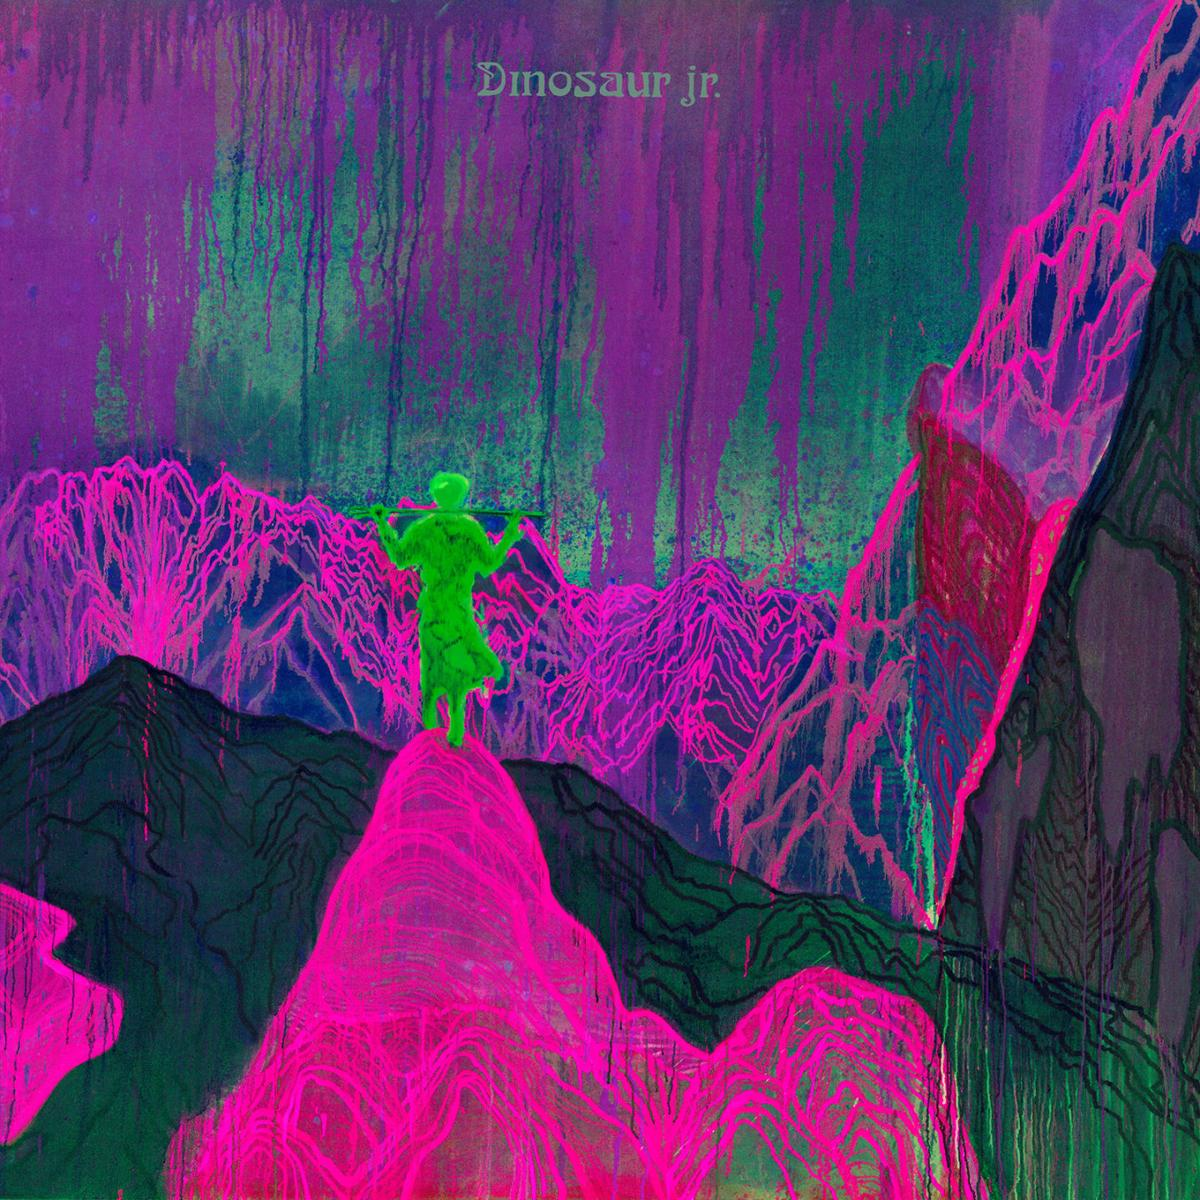 Dinosaur Jr. album cover provided by Jagjaguwar.jpg _lowres